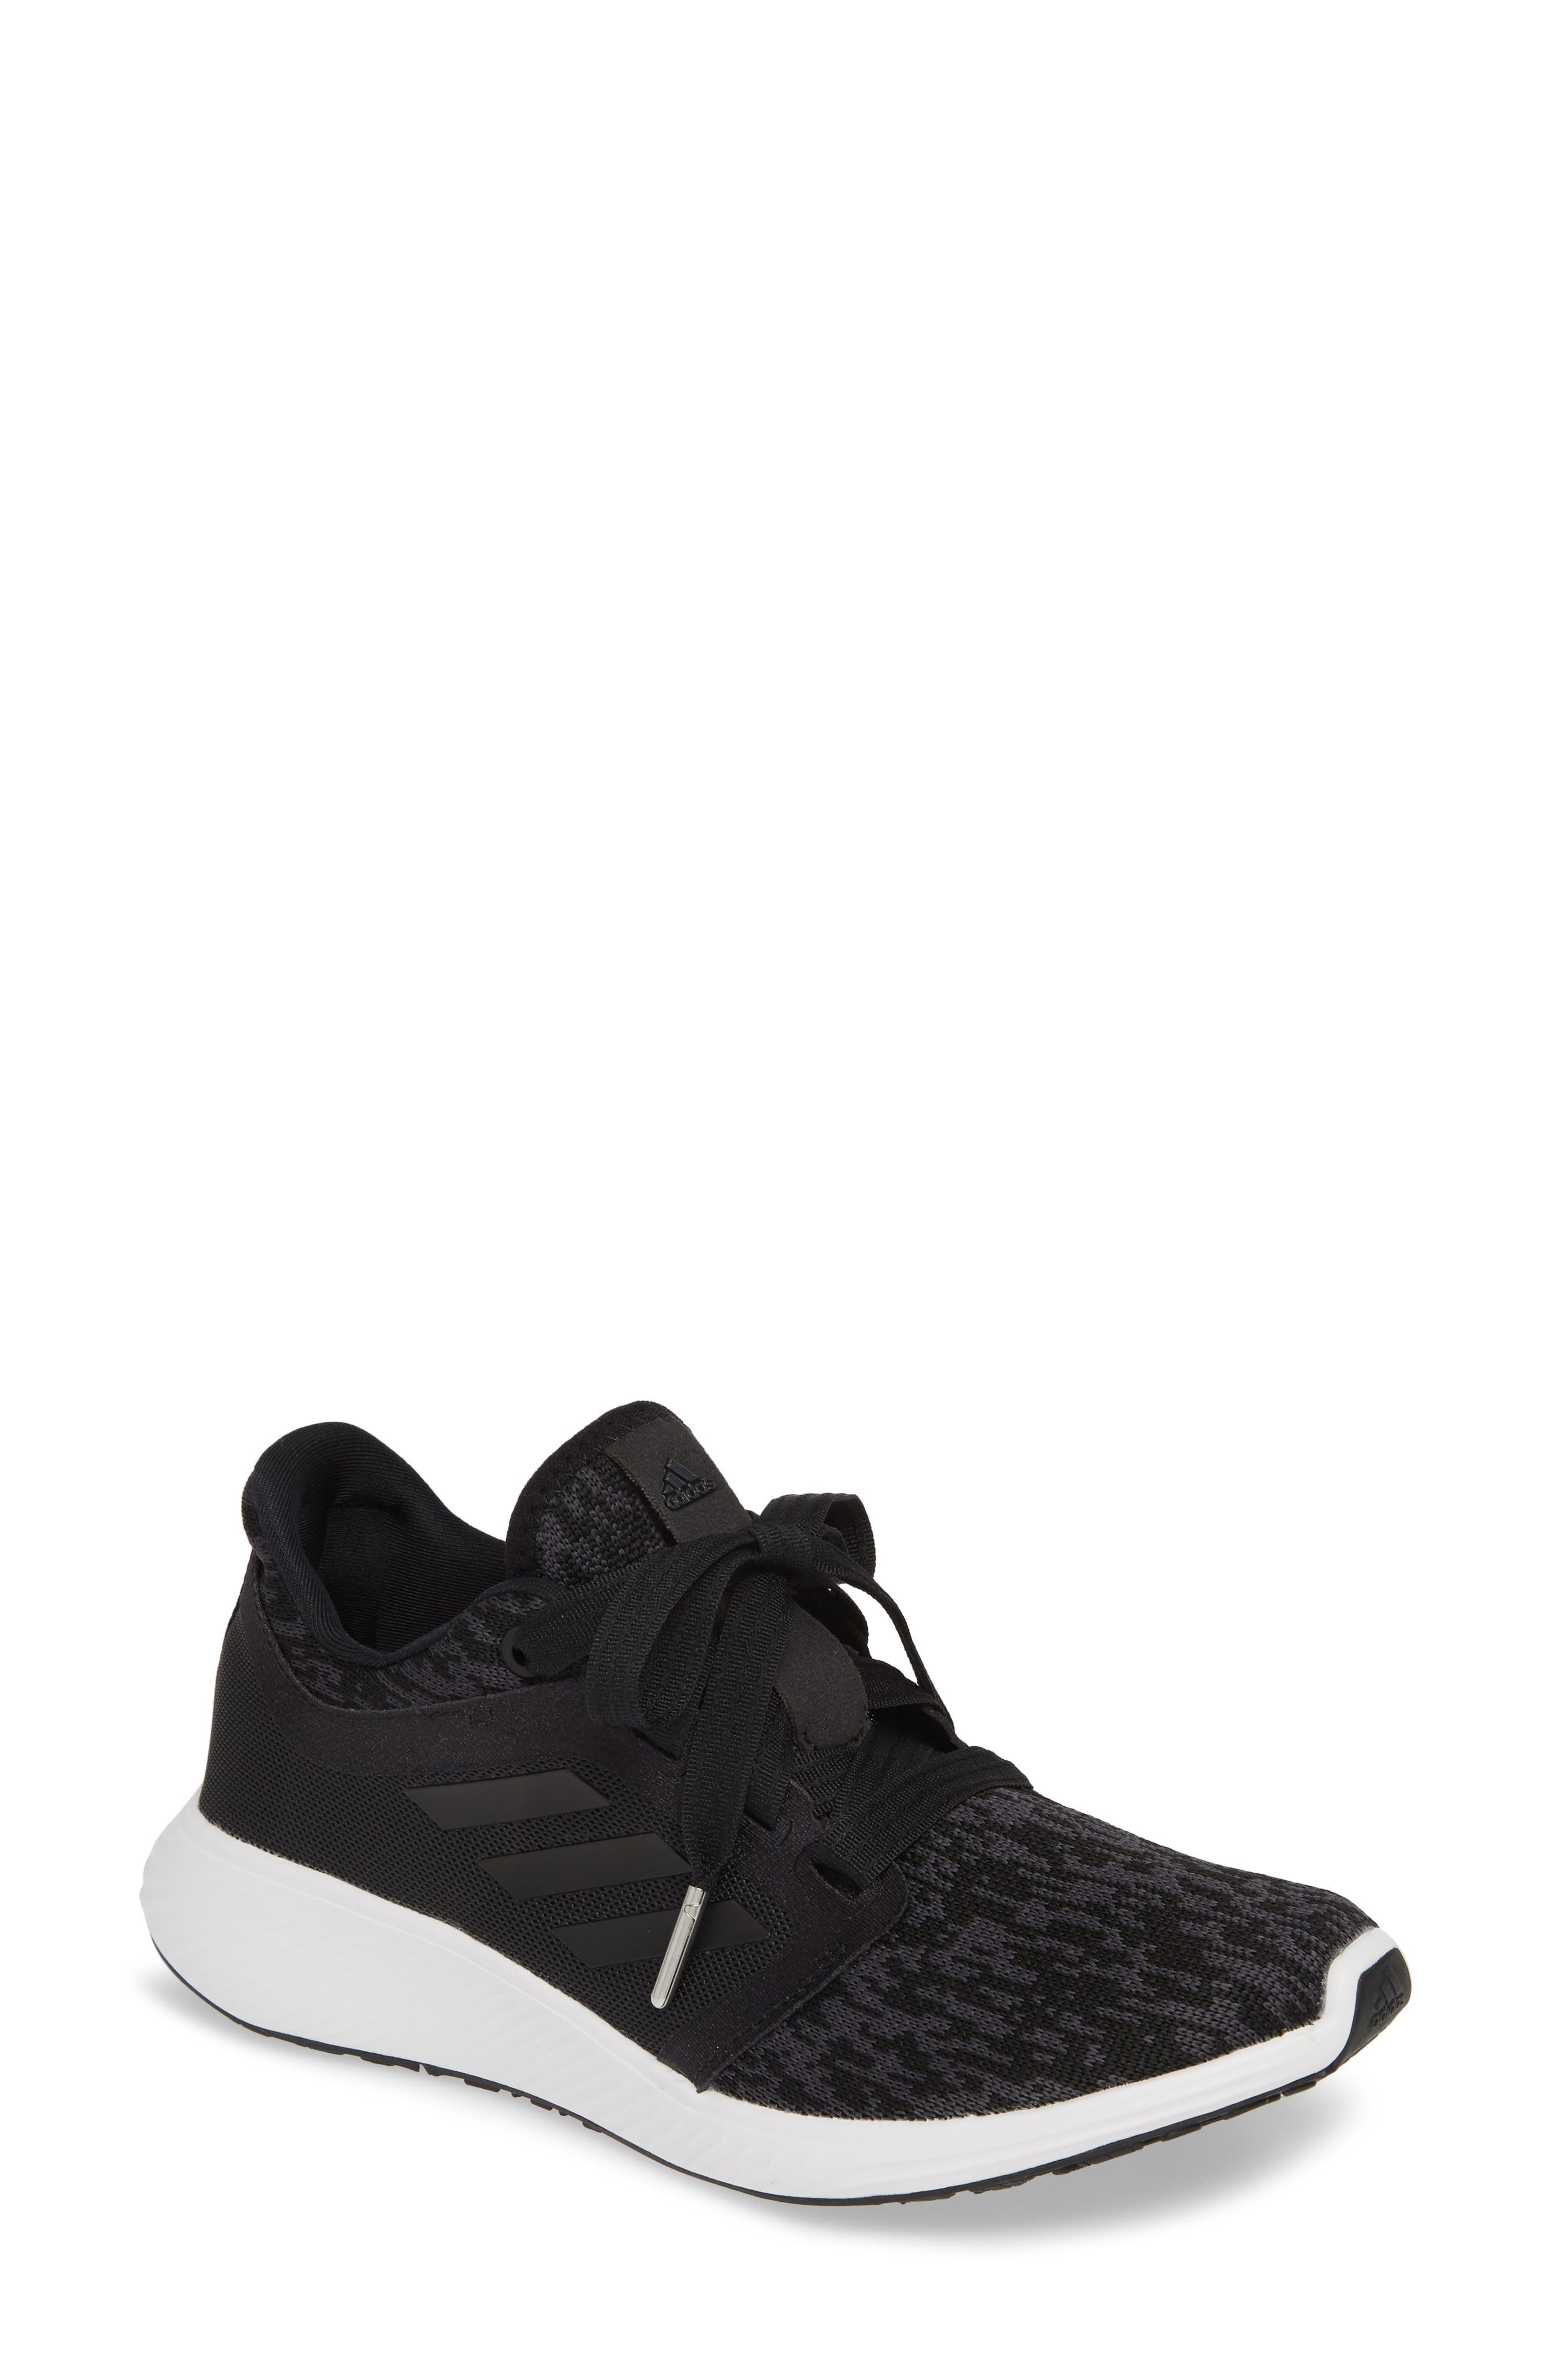 Edge Lux 3 Running Shoe